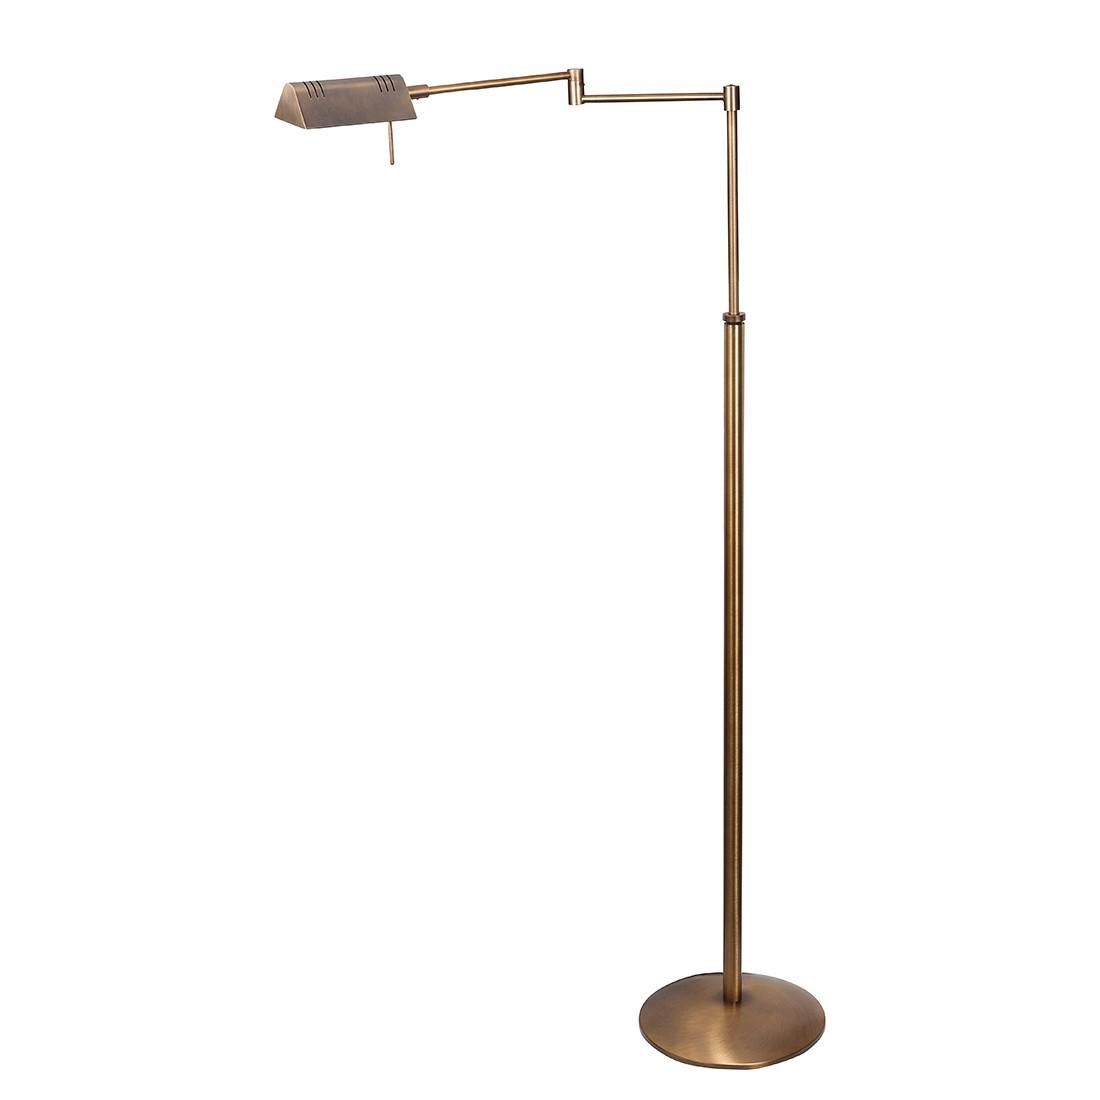 energie  A+, LED-staande lamp Perpetua - 1 lichtbron gebruind messing, Steinhauer